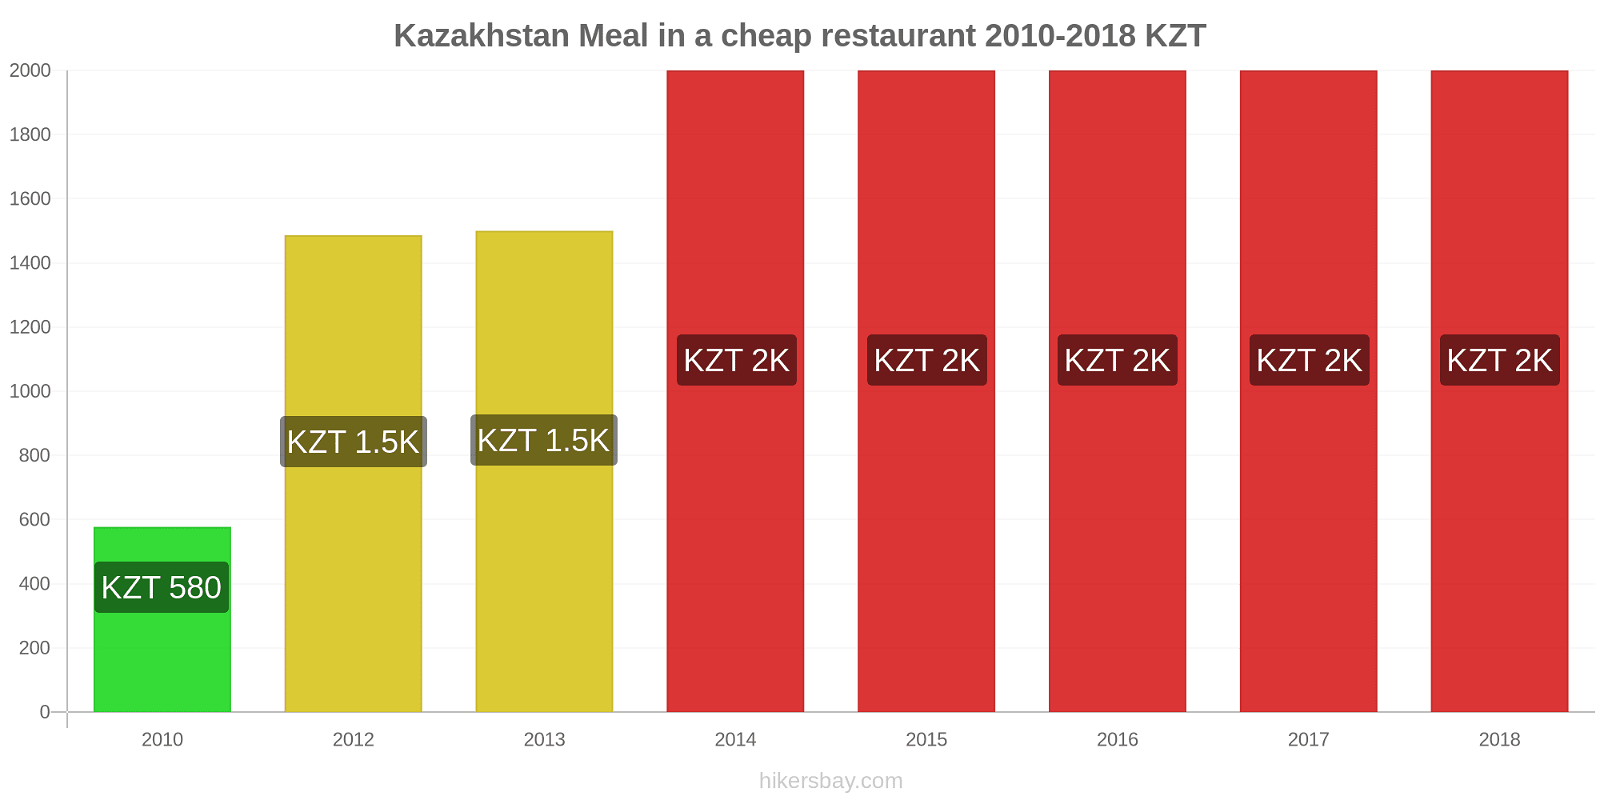 Kazakhstan price changes Meal in a cheap restaurant hikersbay.com